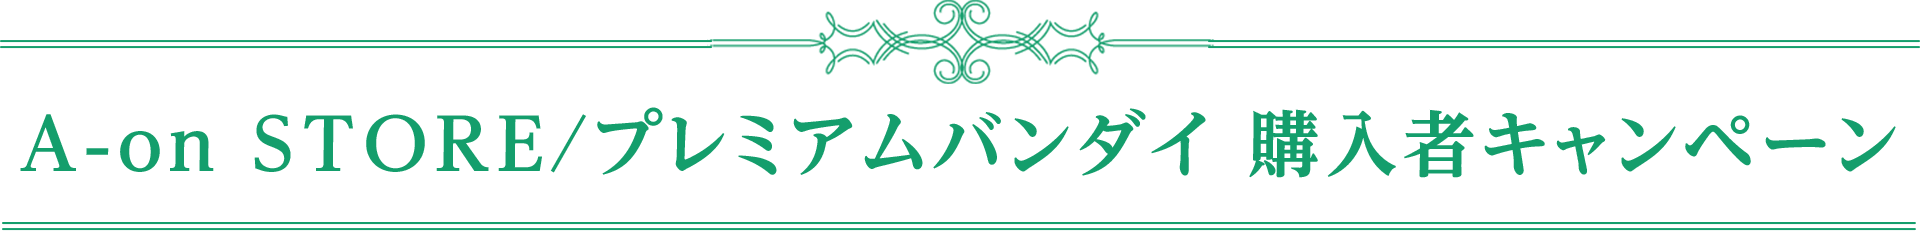 A-on STORE/プレミアムバンダイ 購入者キャンペーン